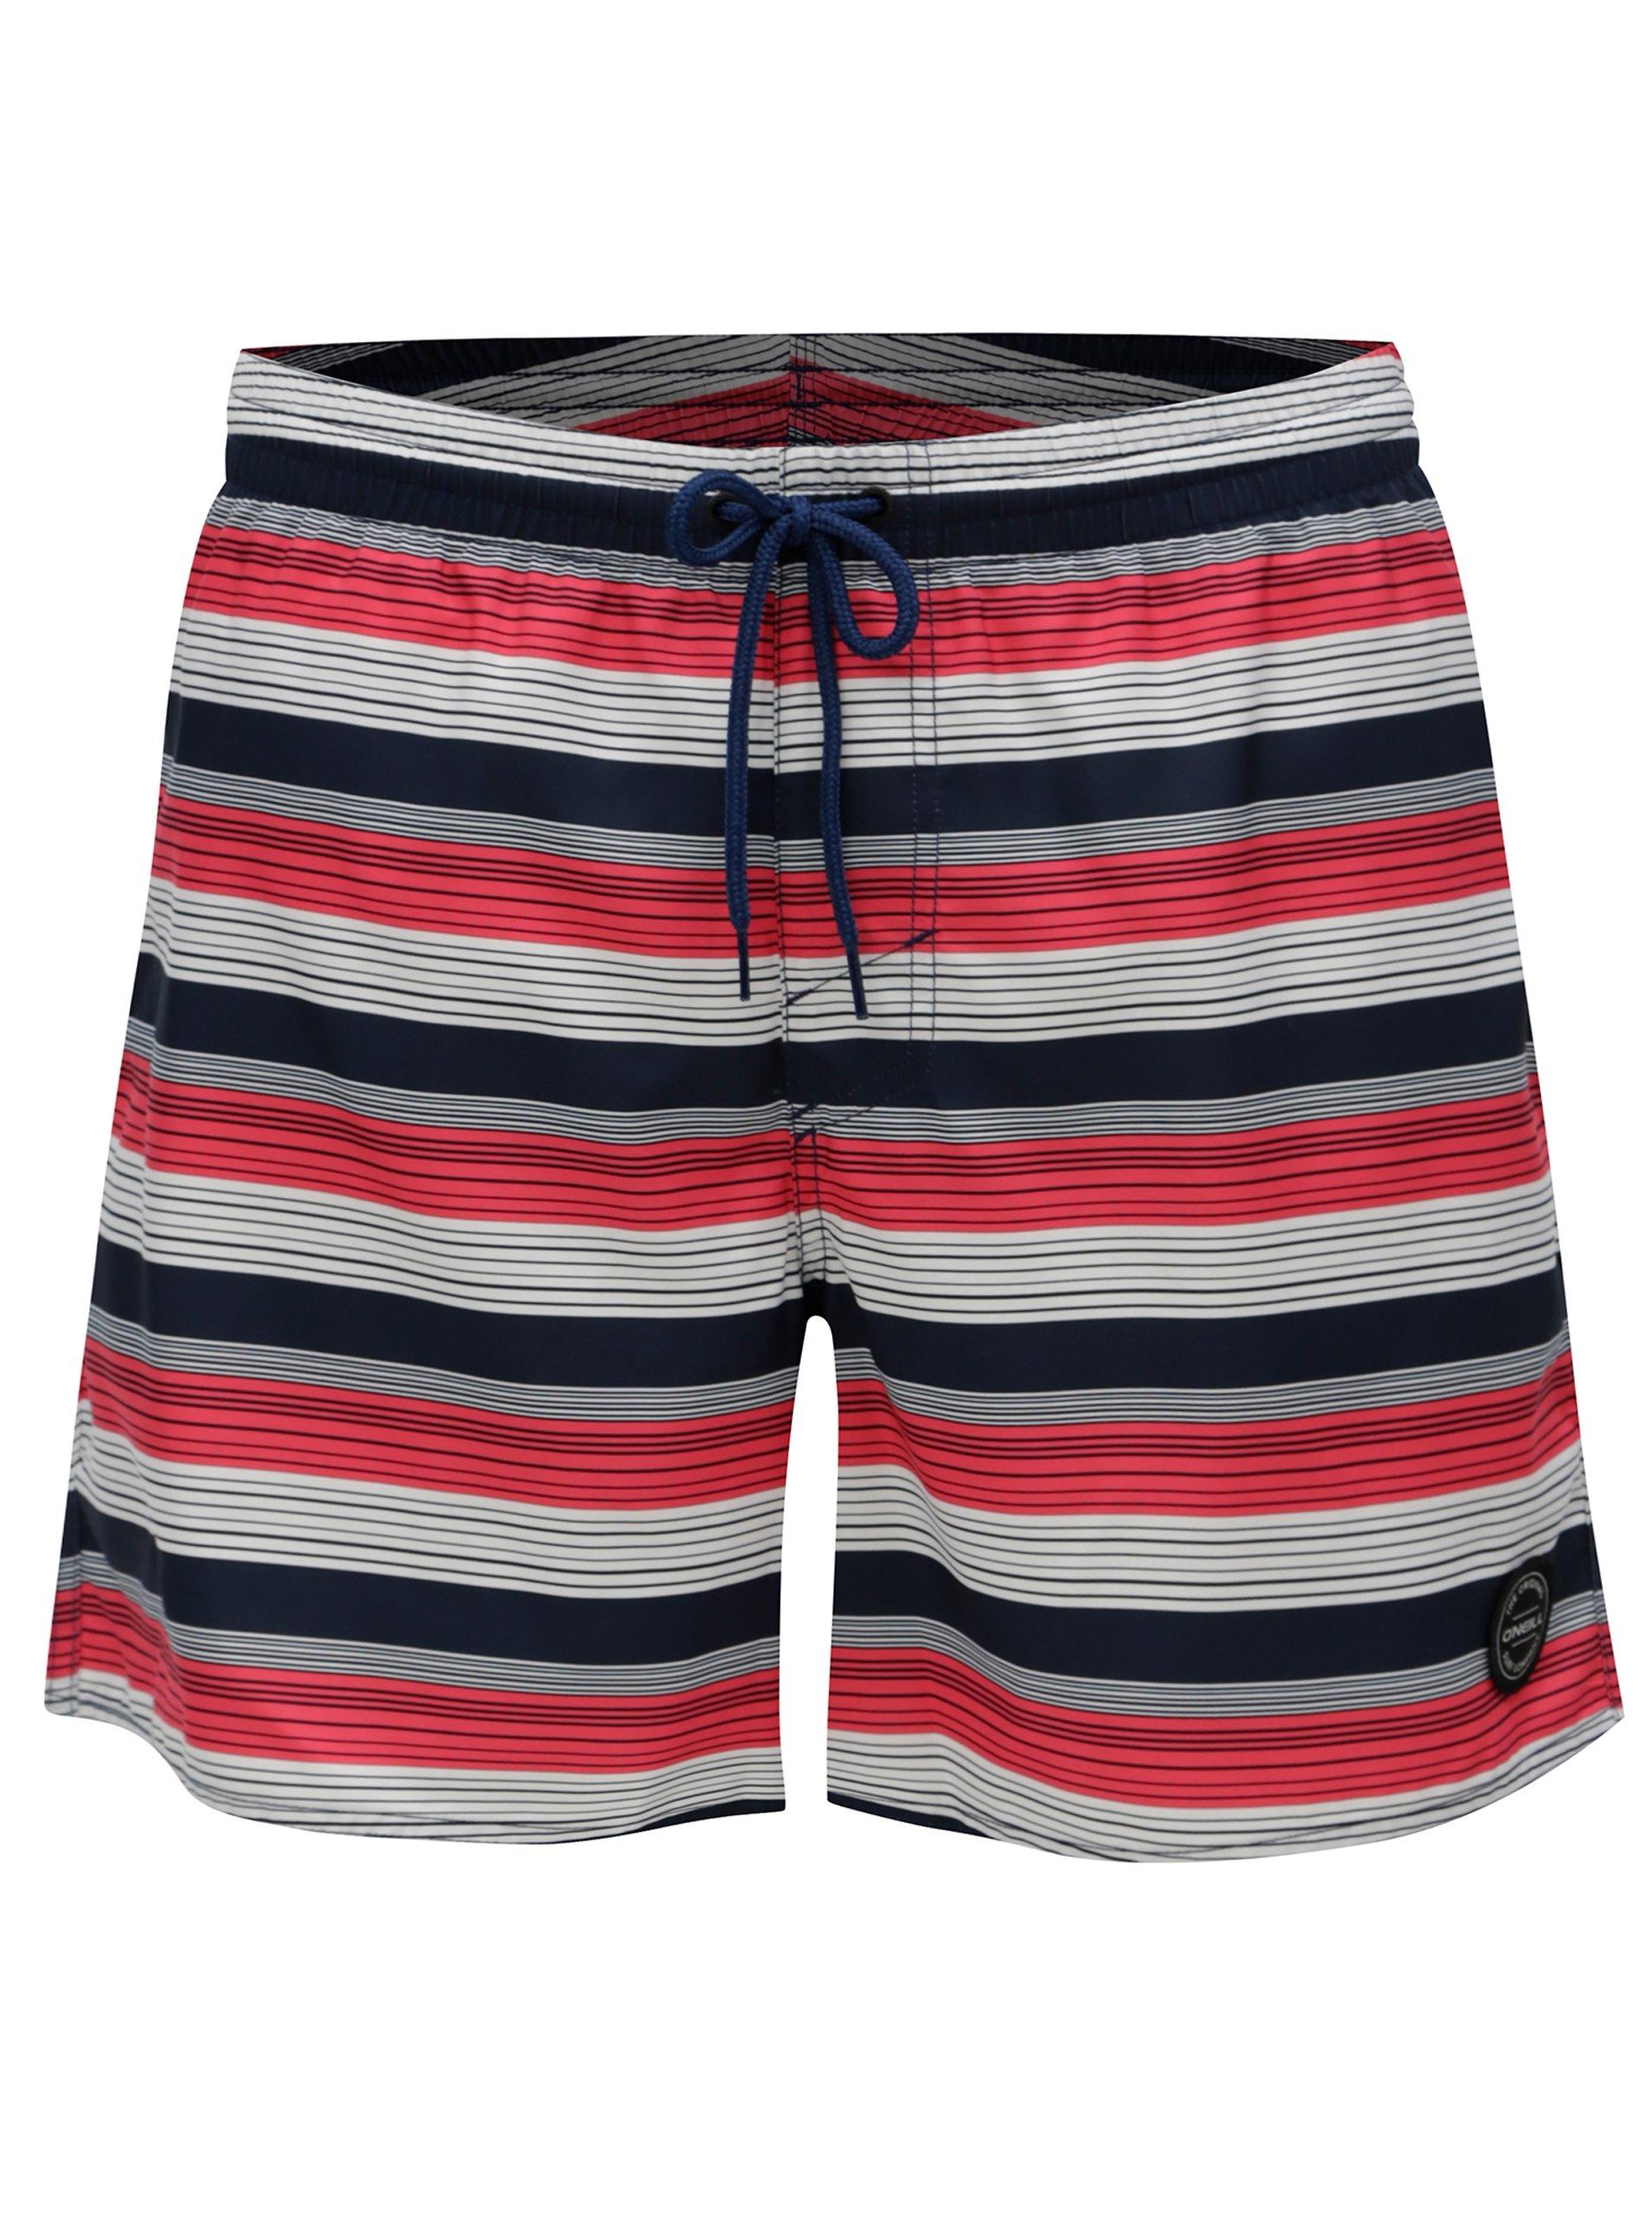 Modro-červené pánske pruhované plavky O'Neill Bondi